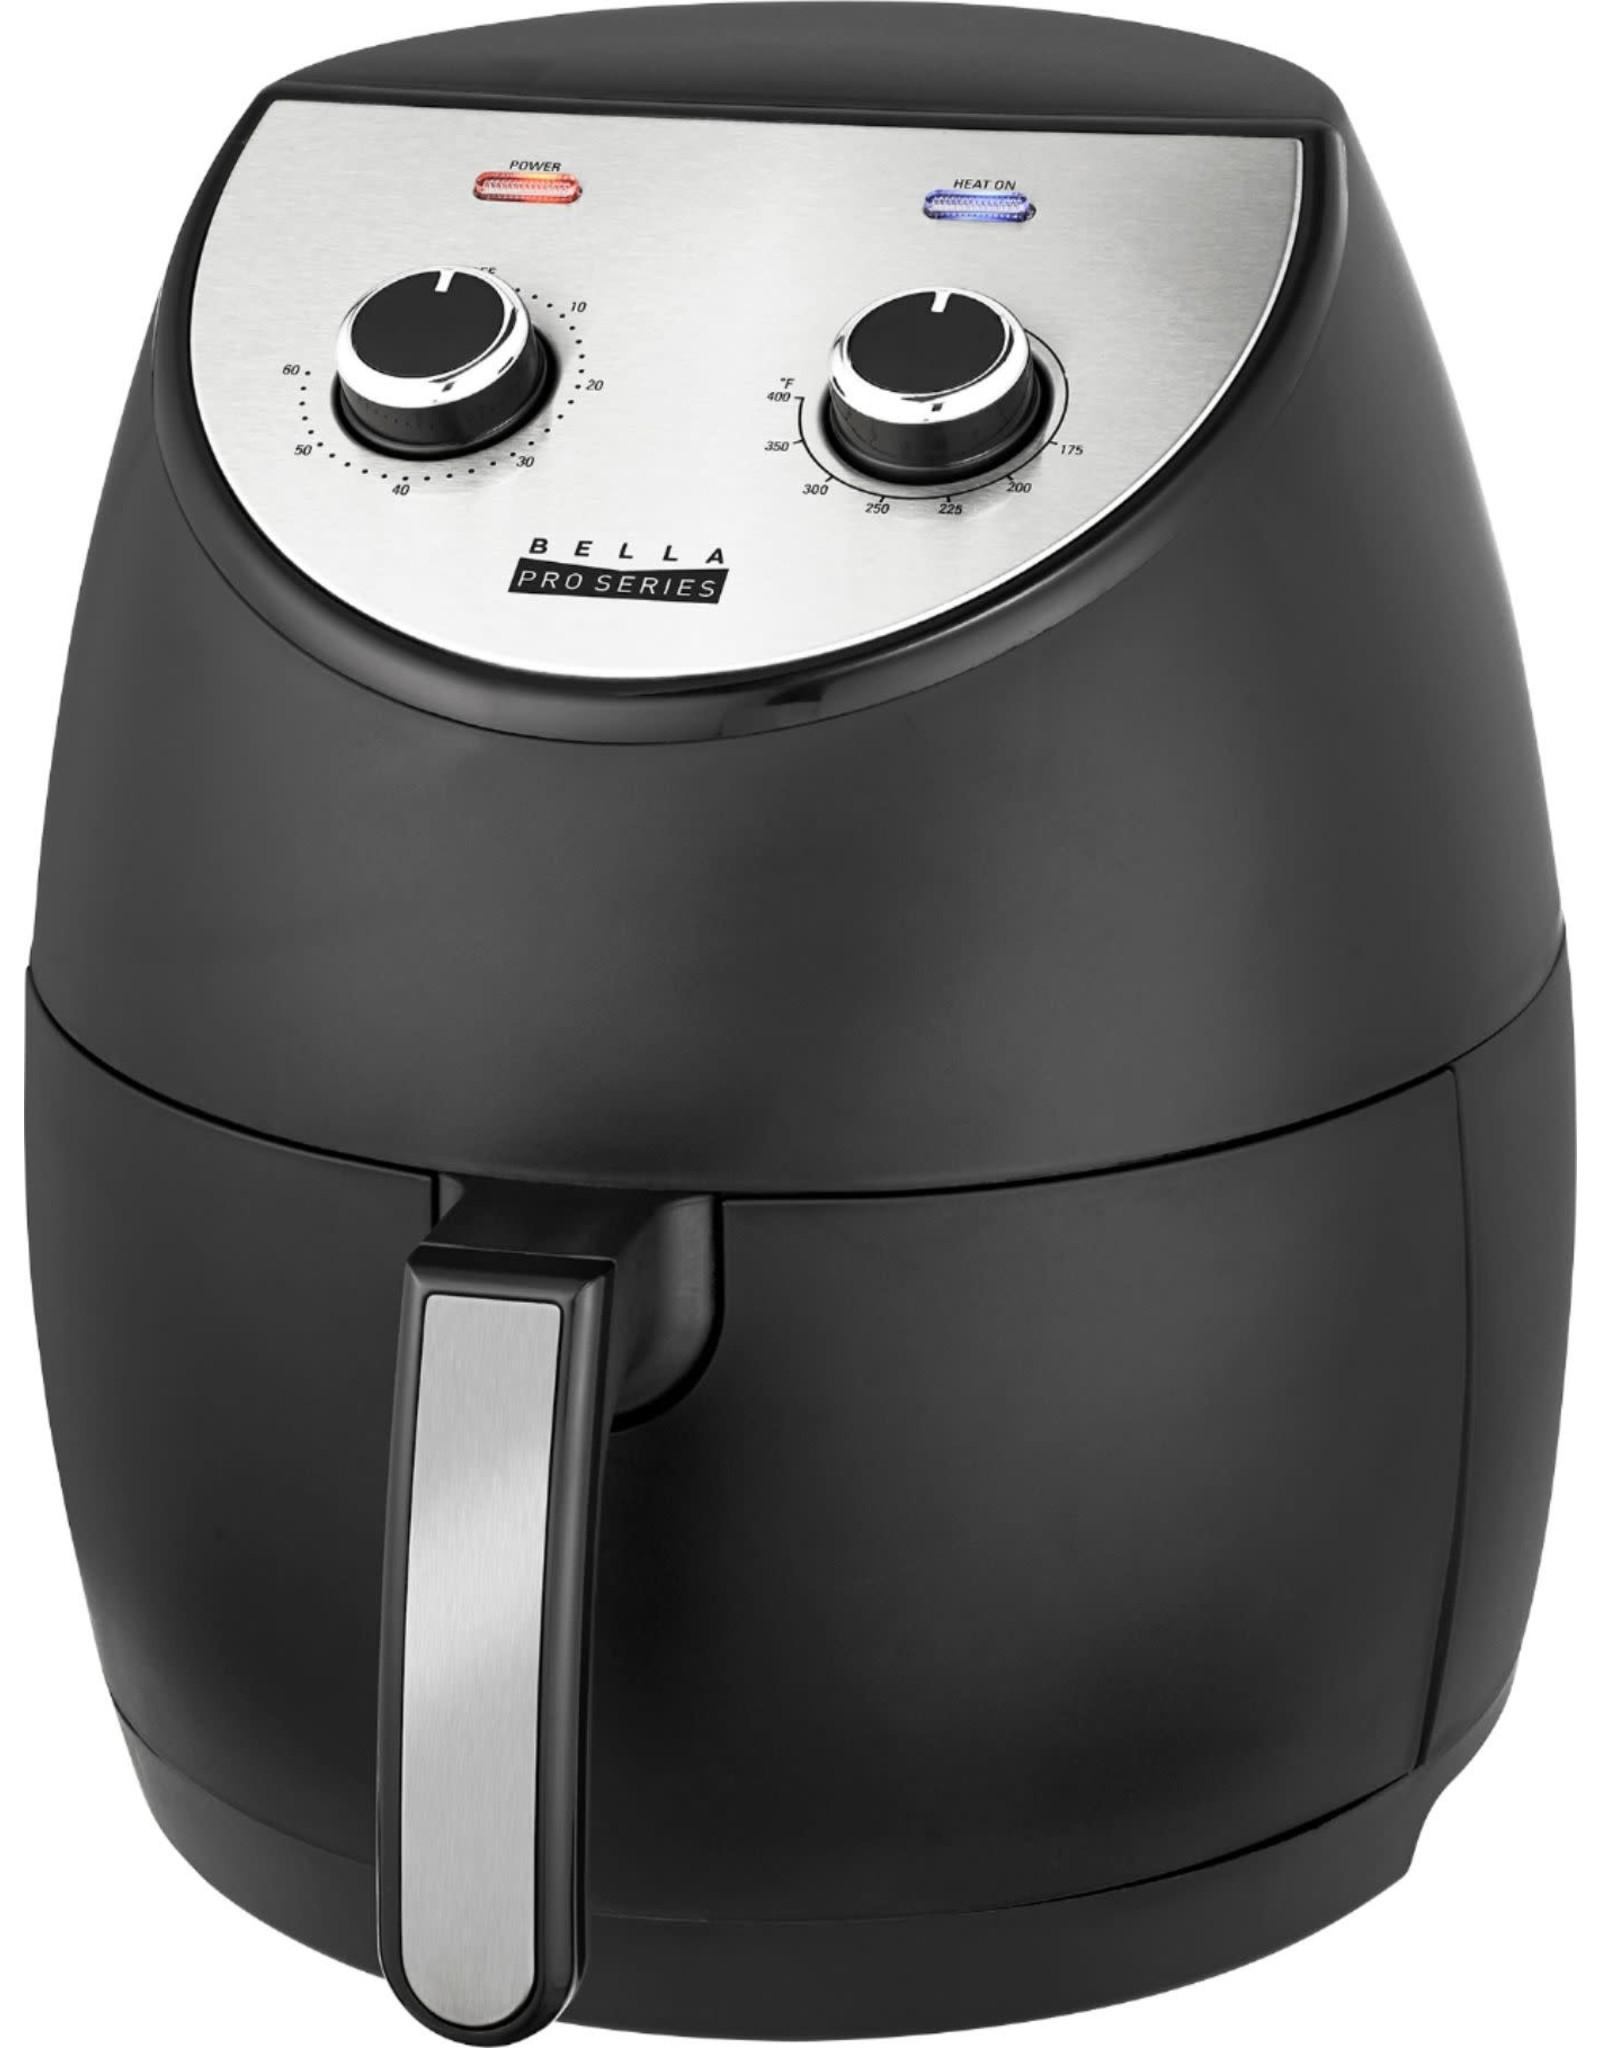 Bella pro 90107 Bella Pro Series - 4.2-qt. Analog Air Fryer - Black Matte